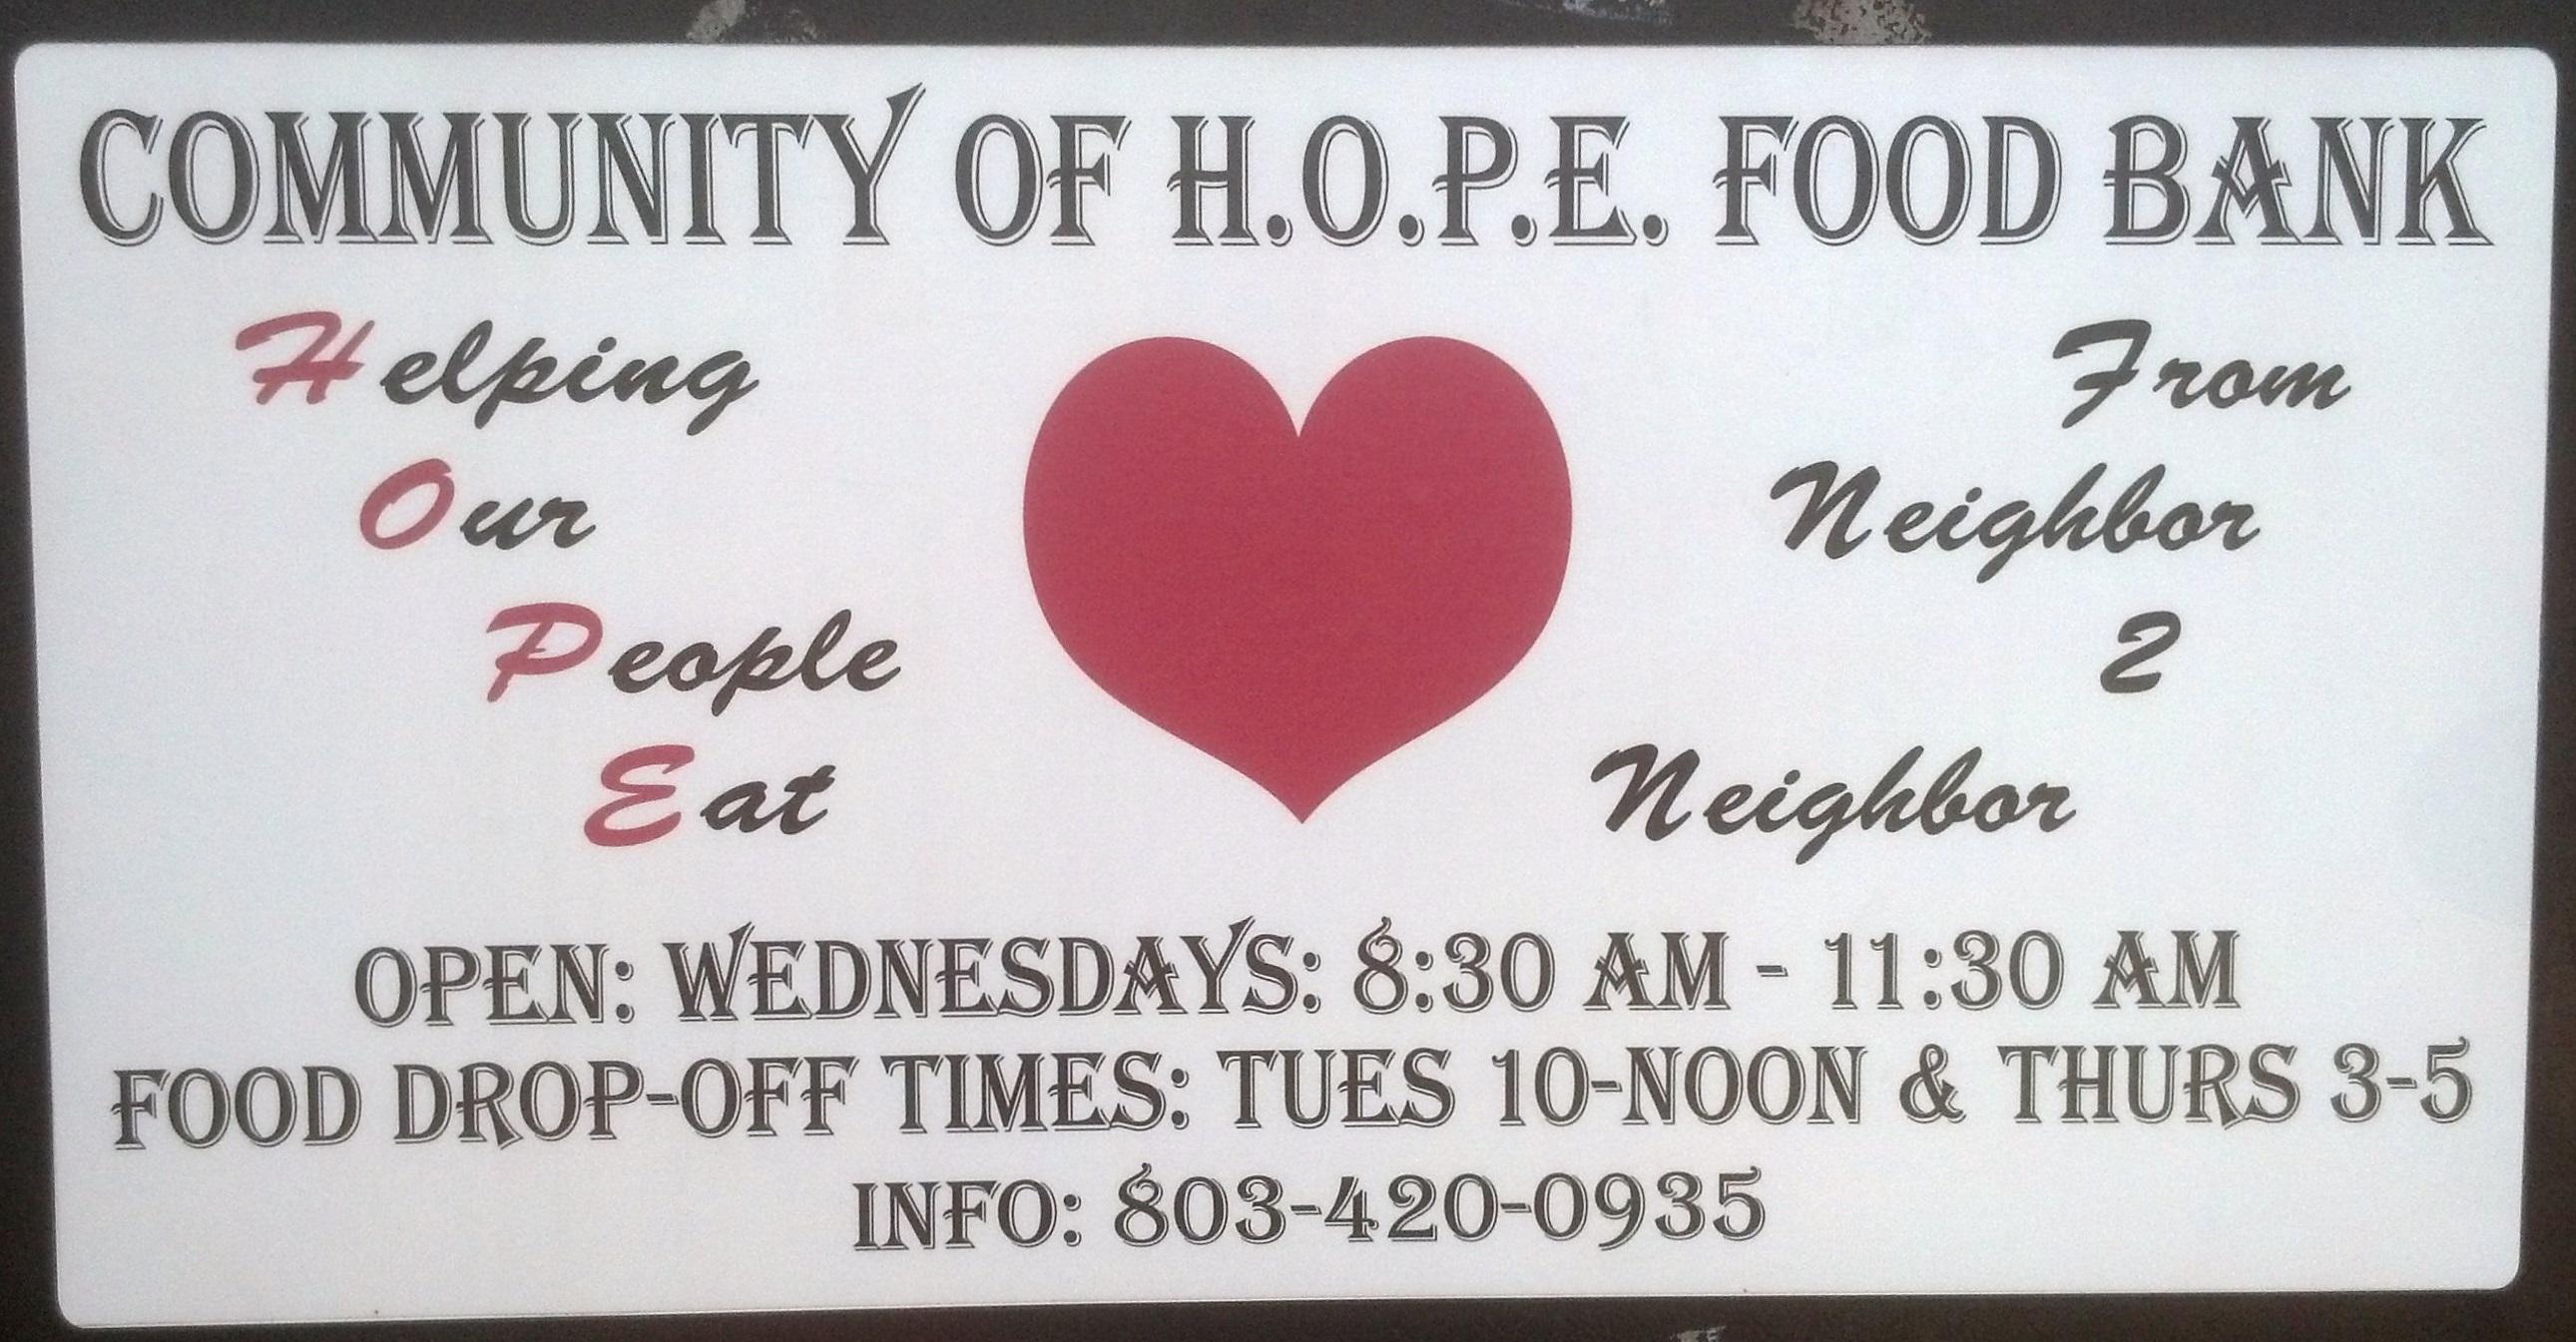 elgin community of hope food bank